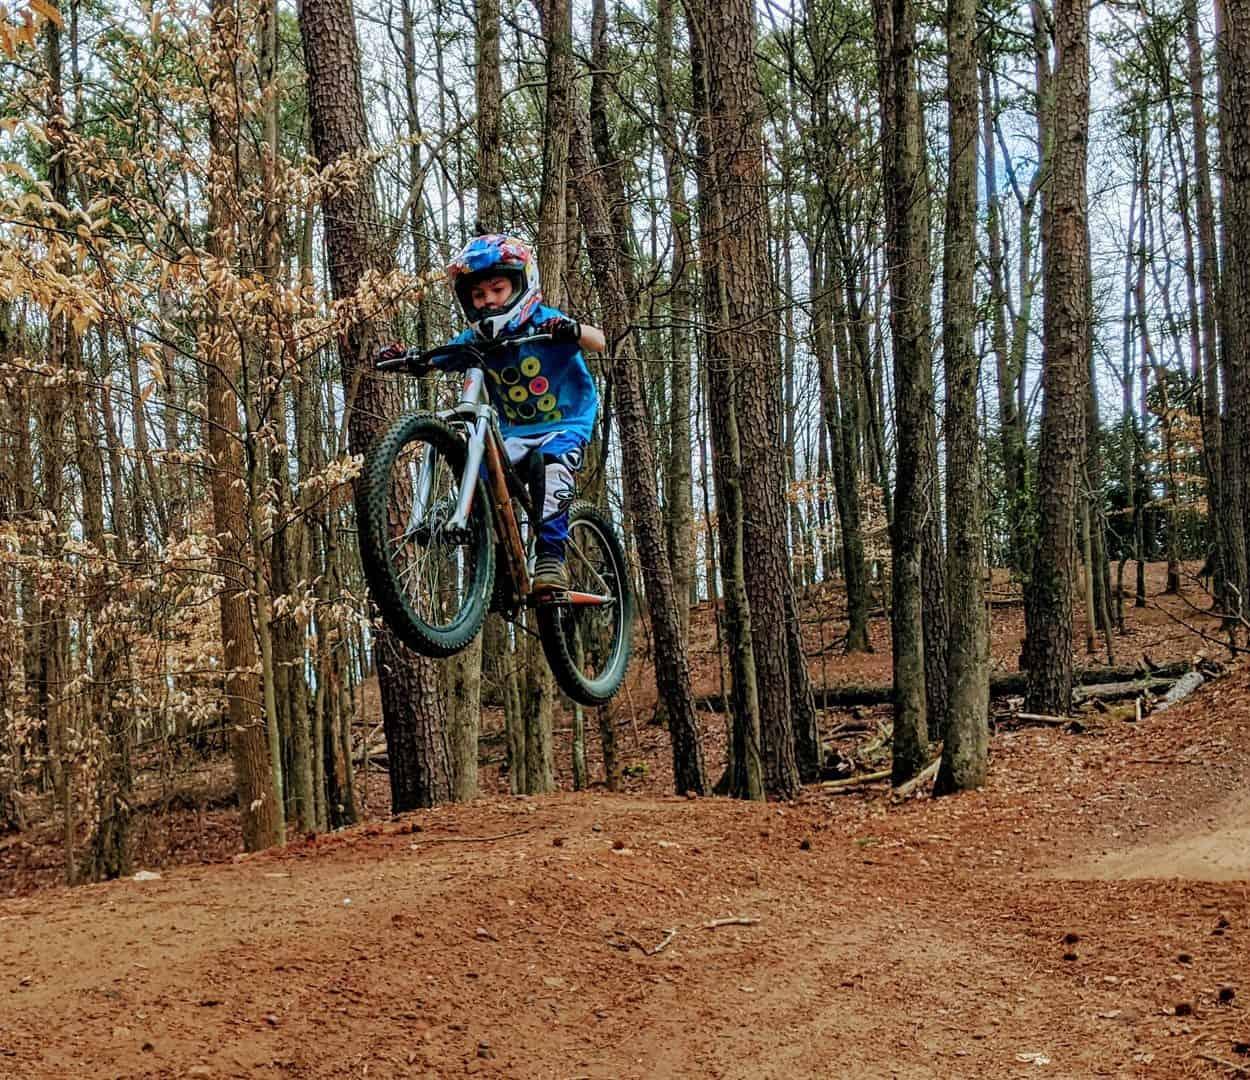 Best Dirt Jump Bikes For 2021